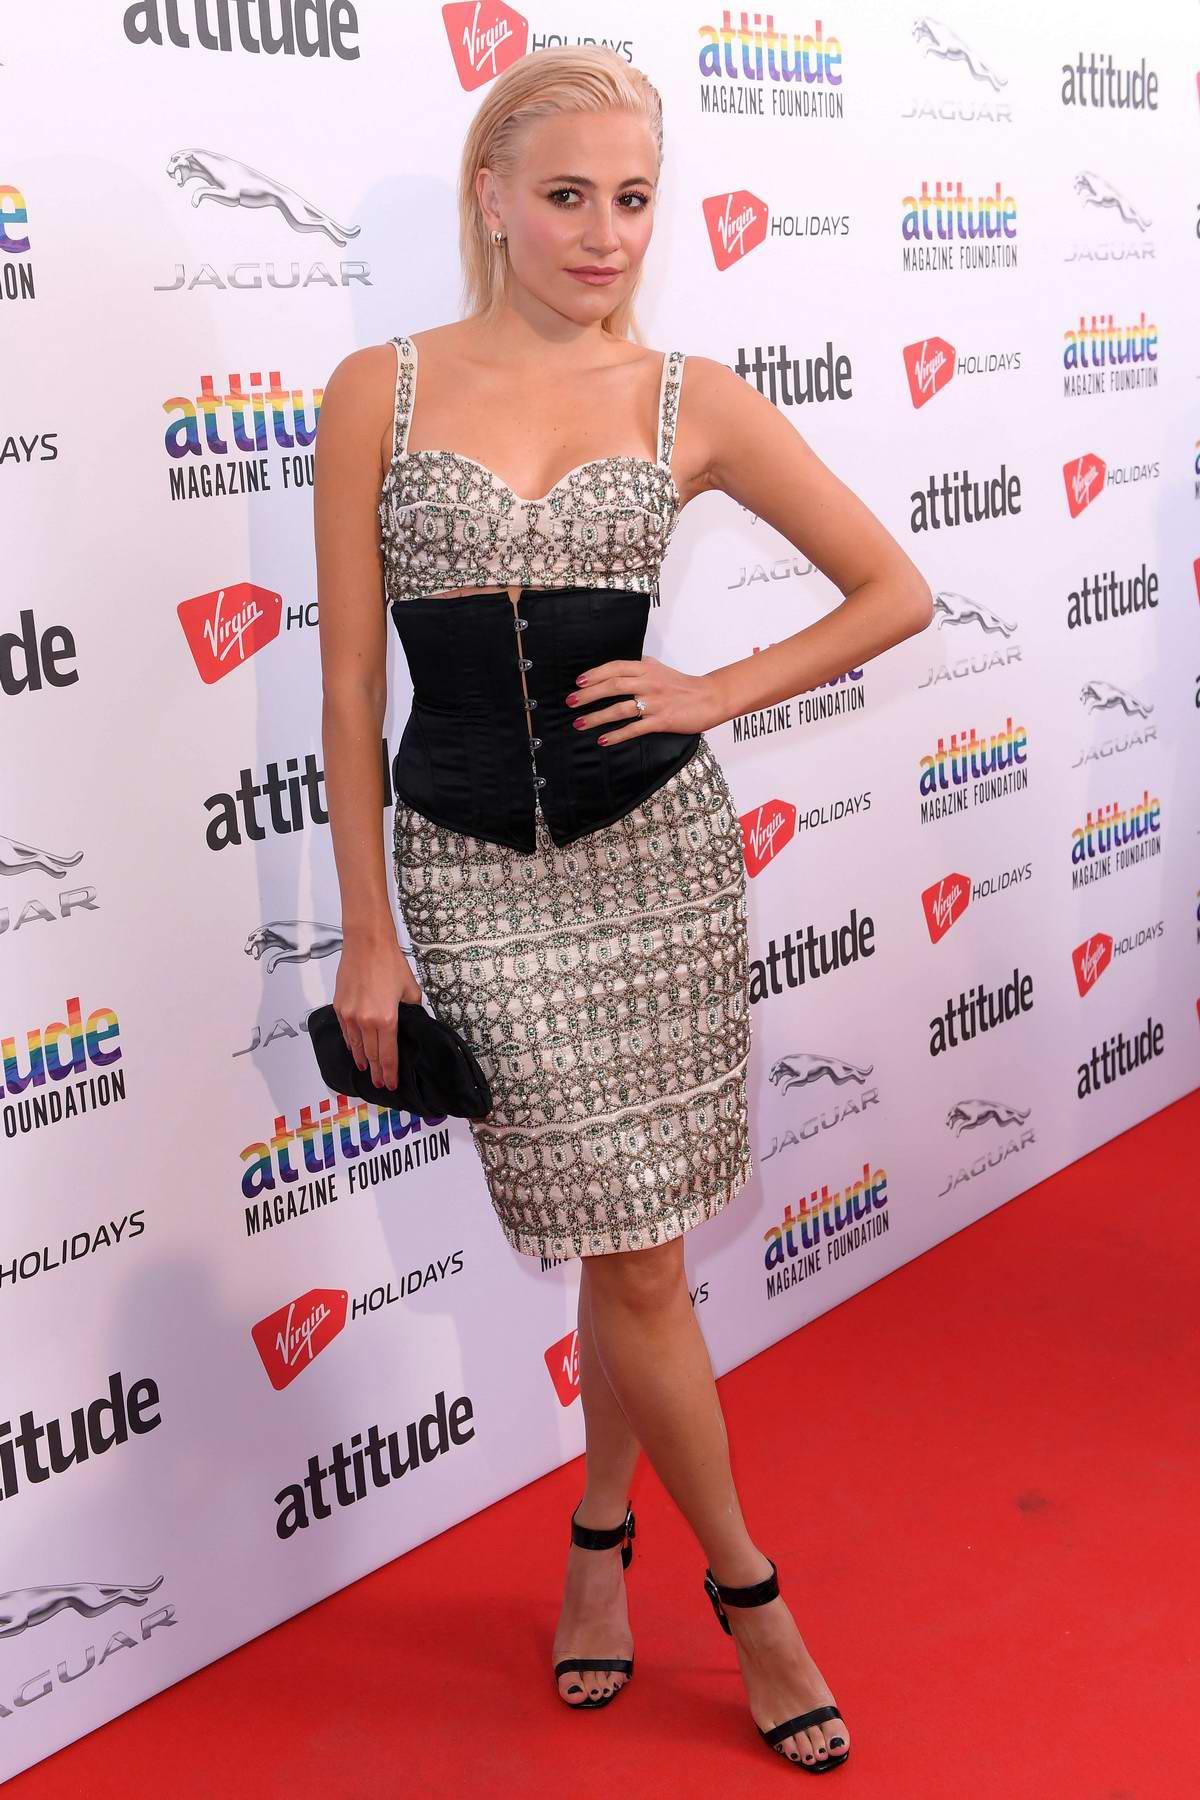 Pixie Lott attends the Attitude Magazine Awards 2018 in London, UK